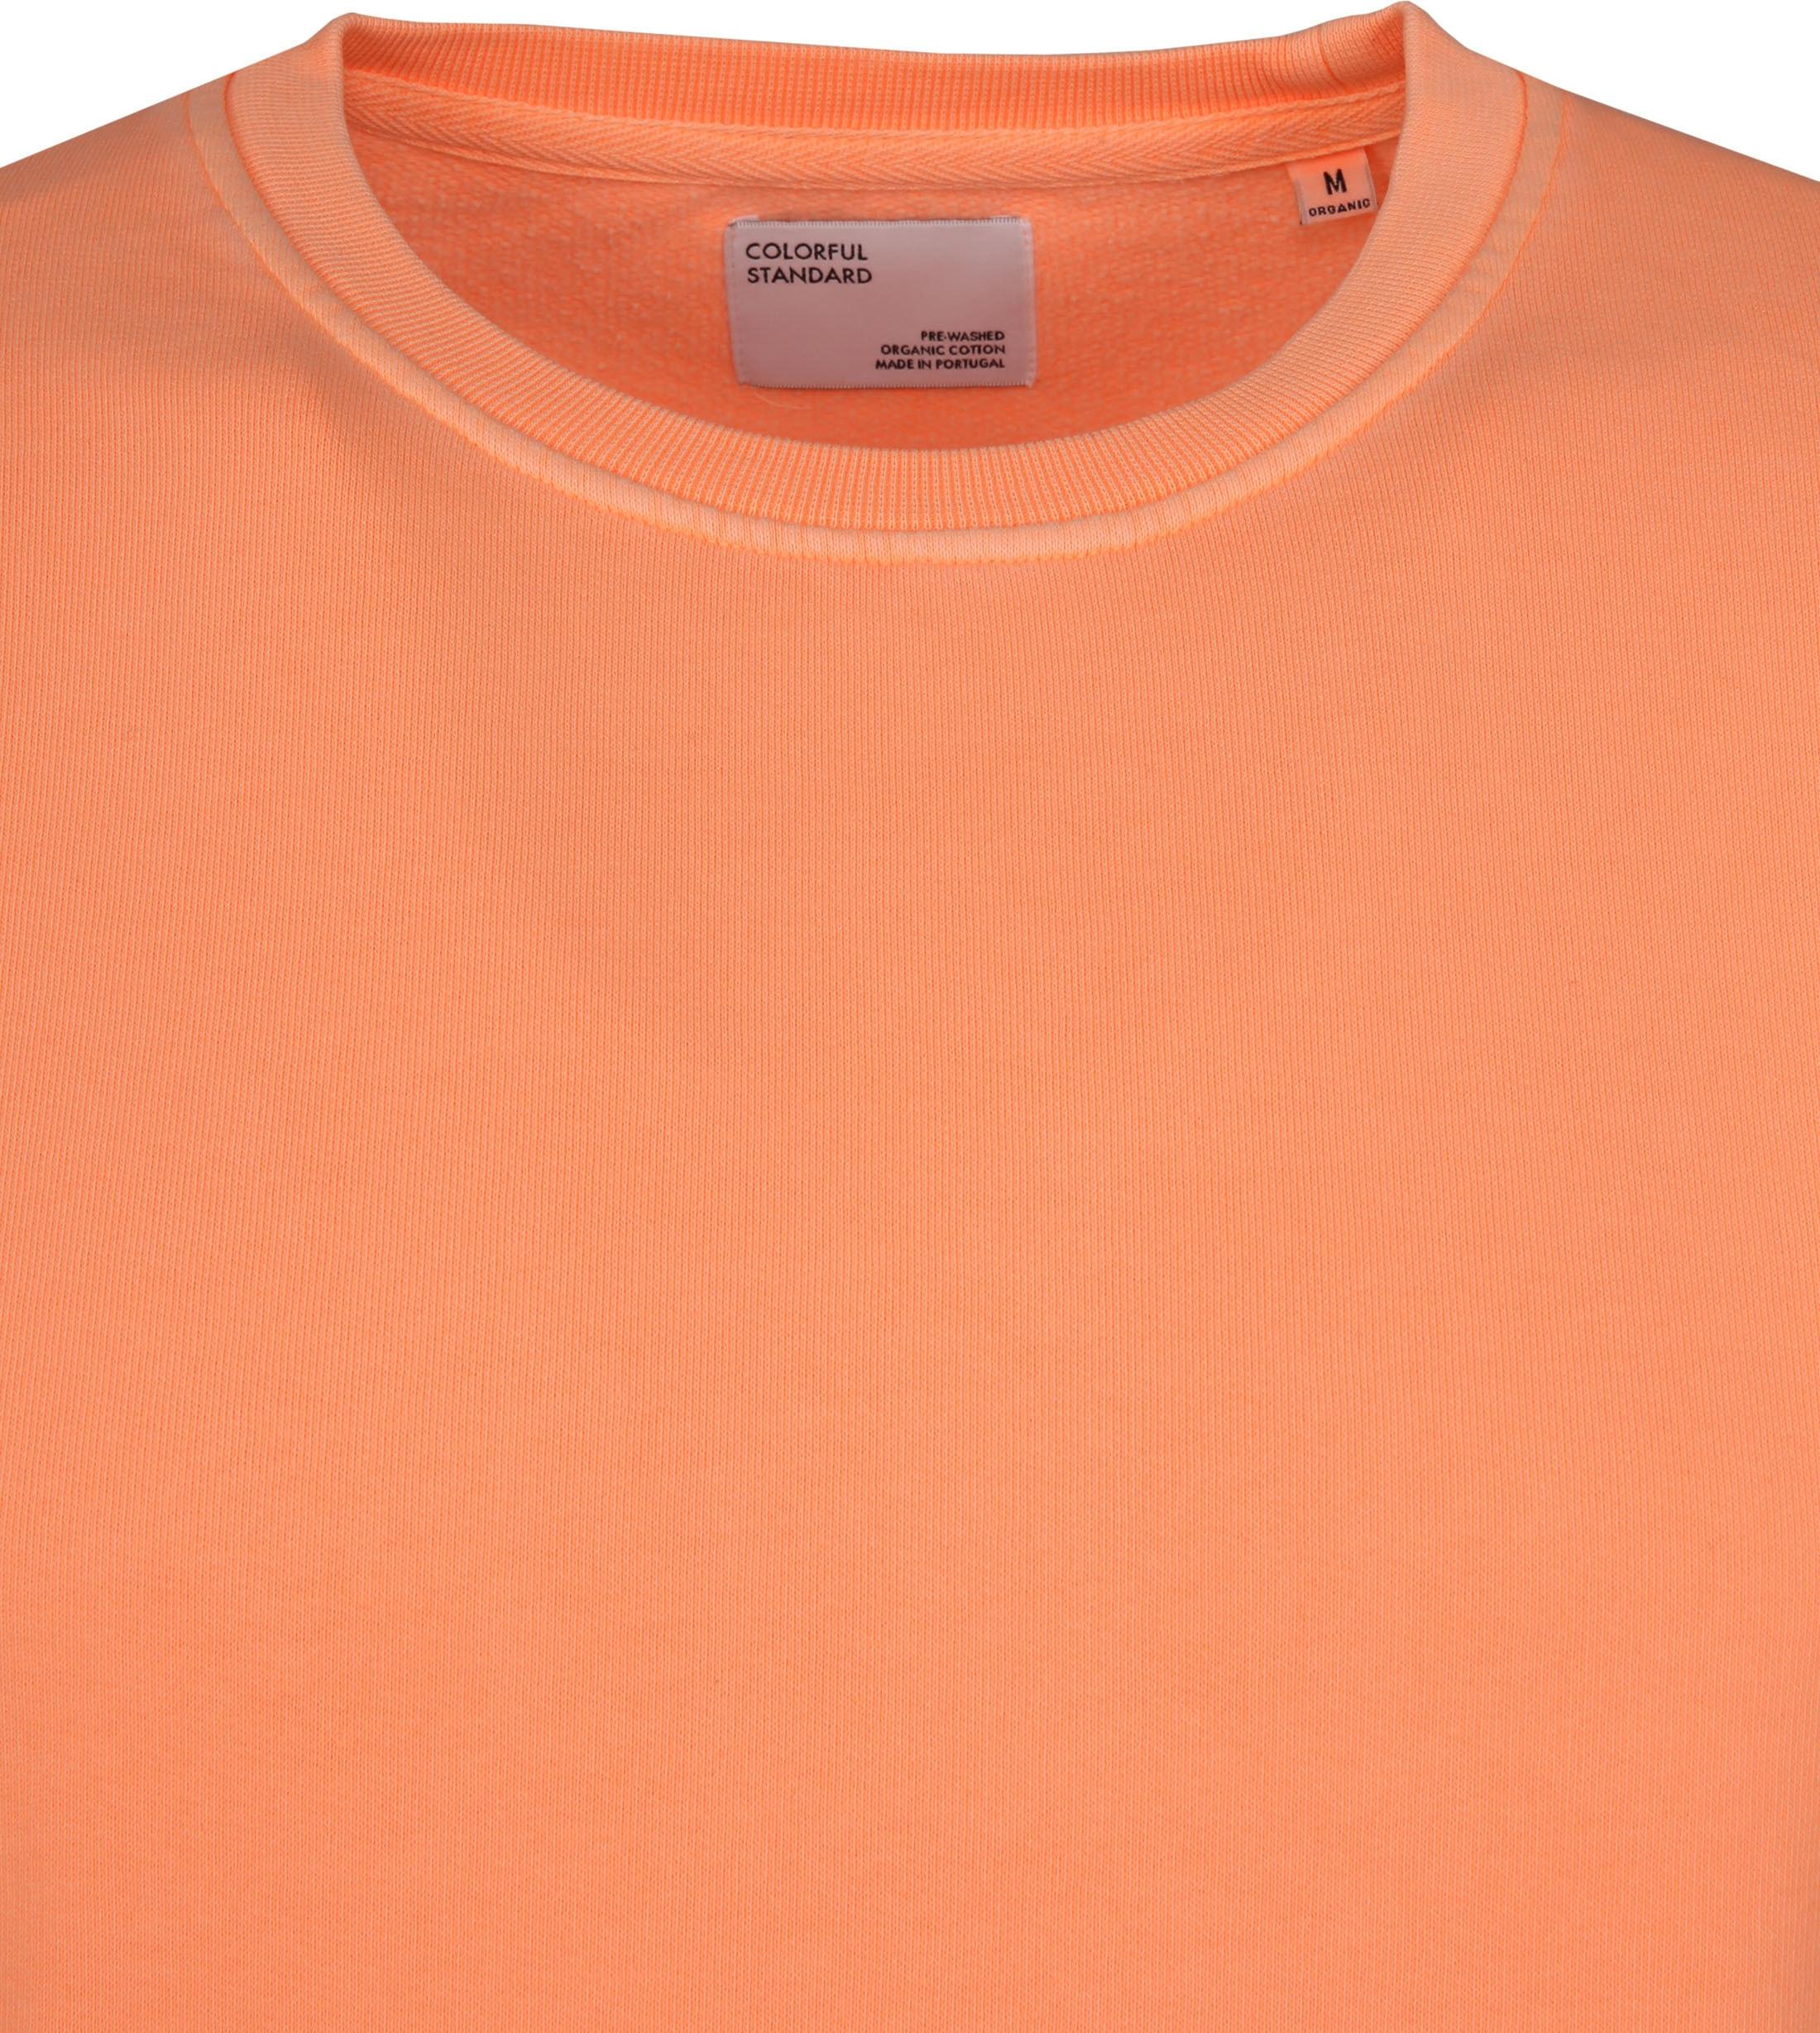 Colorful Standard Sweater Neon Oranje foto 1